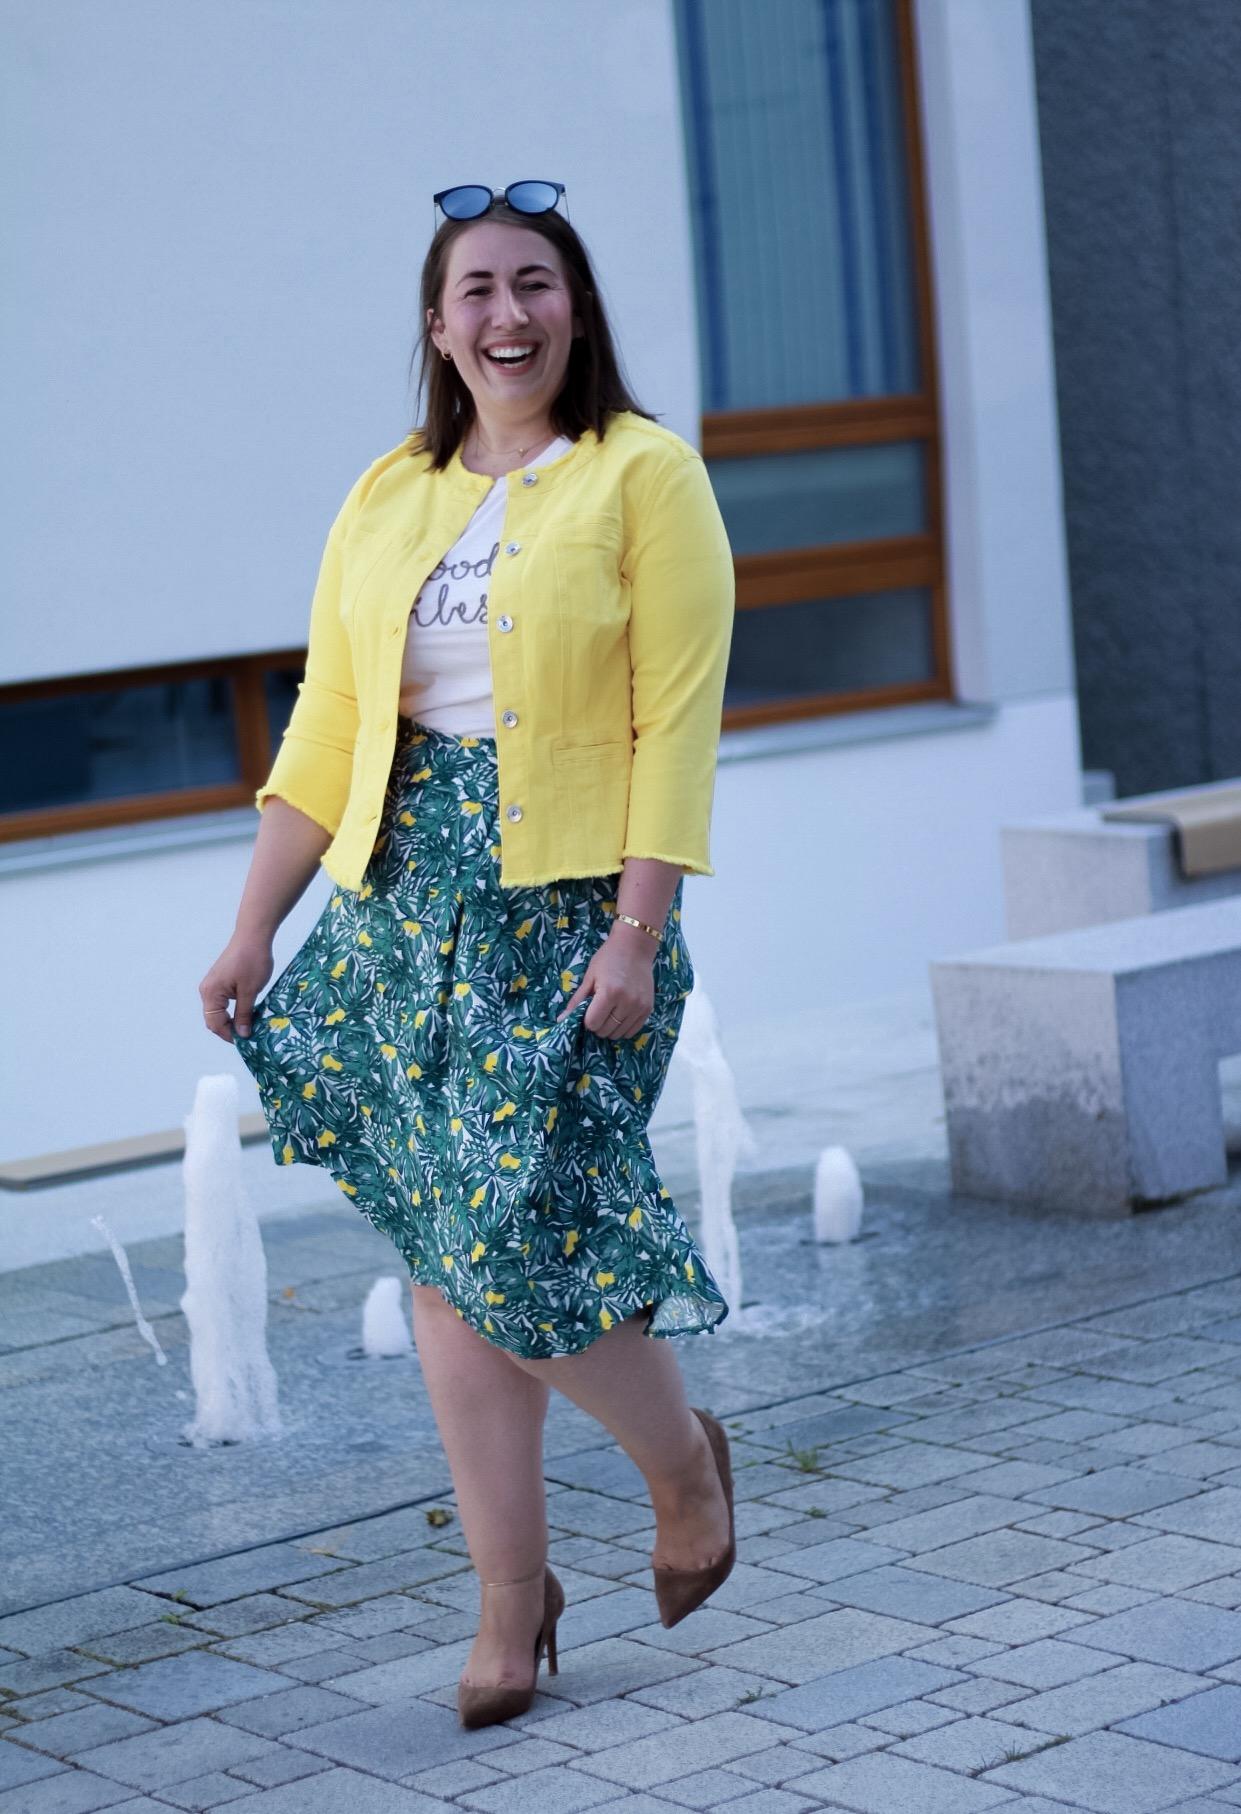 Lemon-Breeze-by-Samoon_Früchte-Print-Tropical-Print-kombinieren-Miss-Suzie-Loves-Susanne-Heidebach